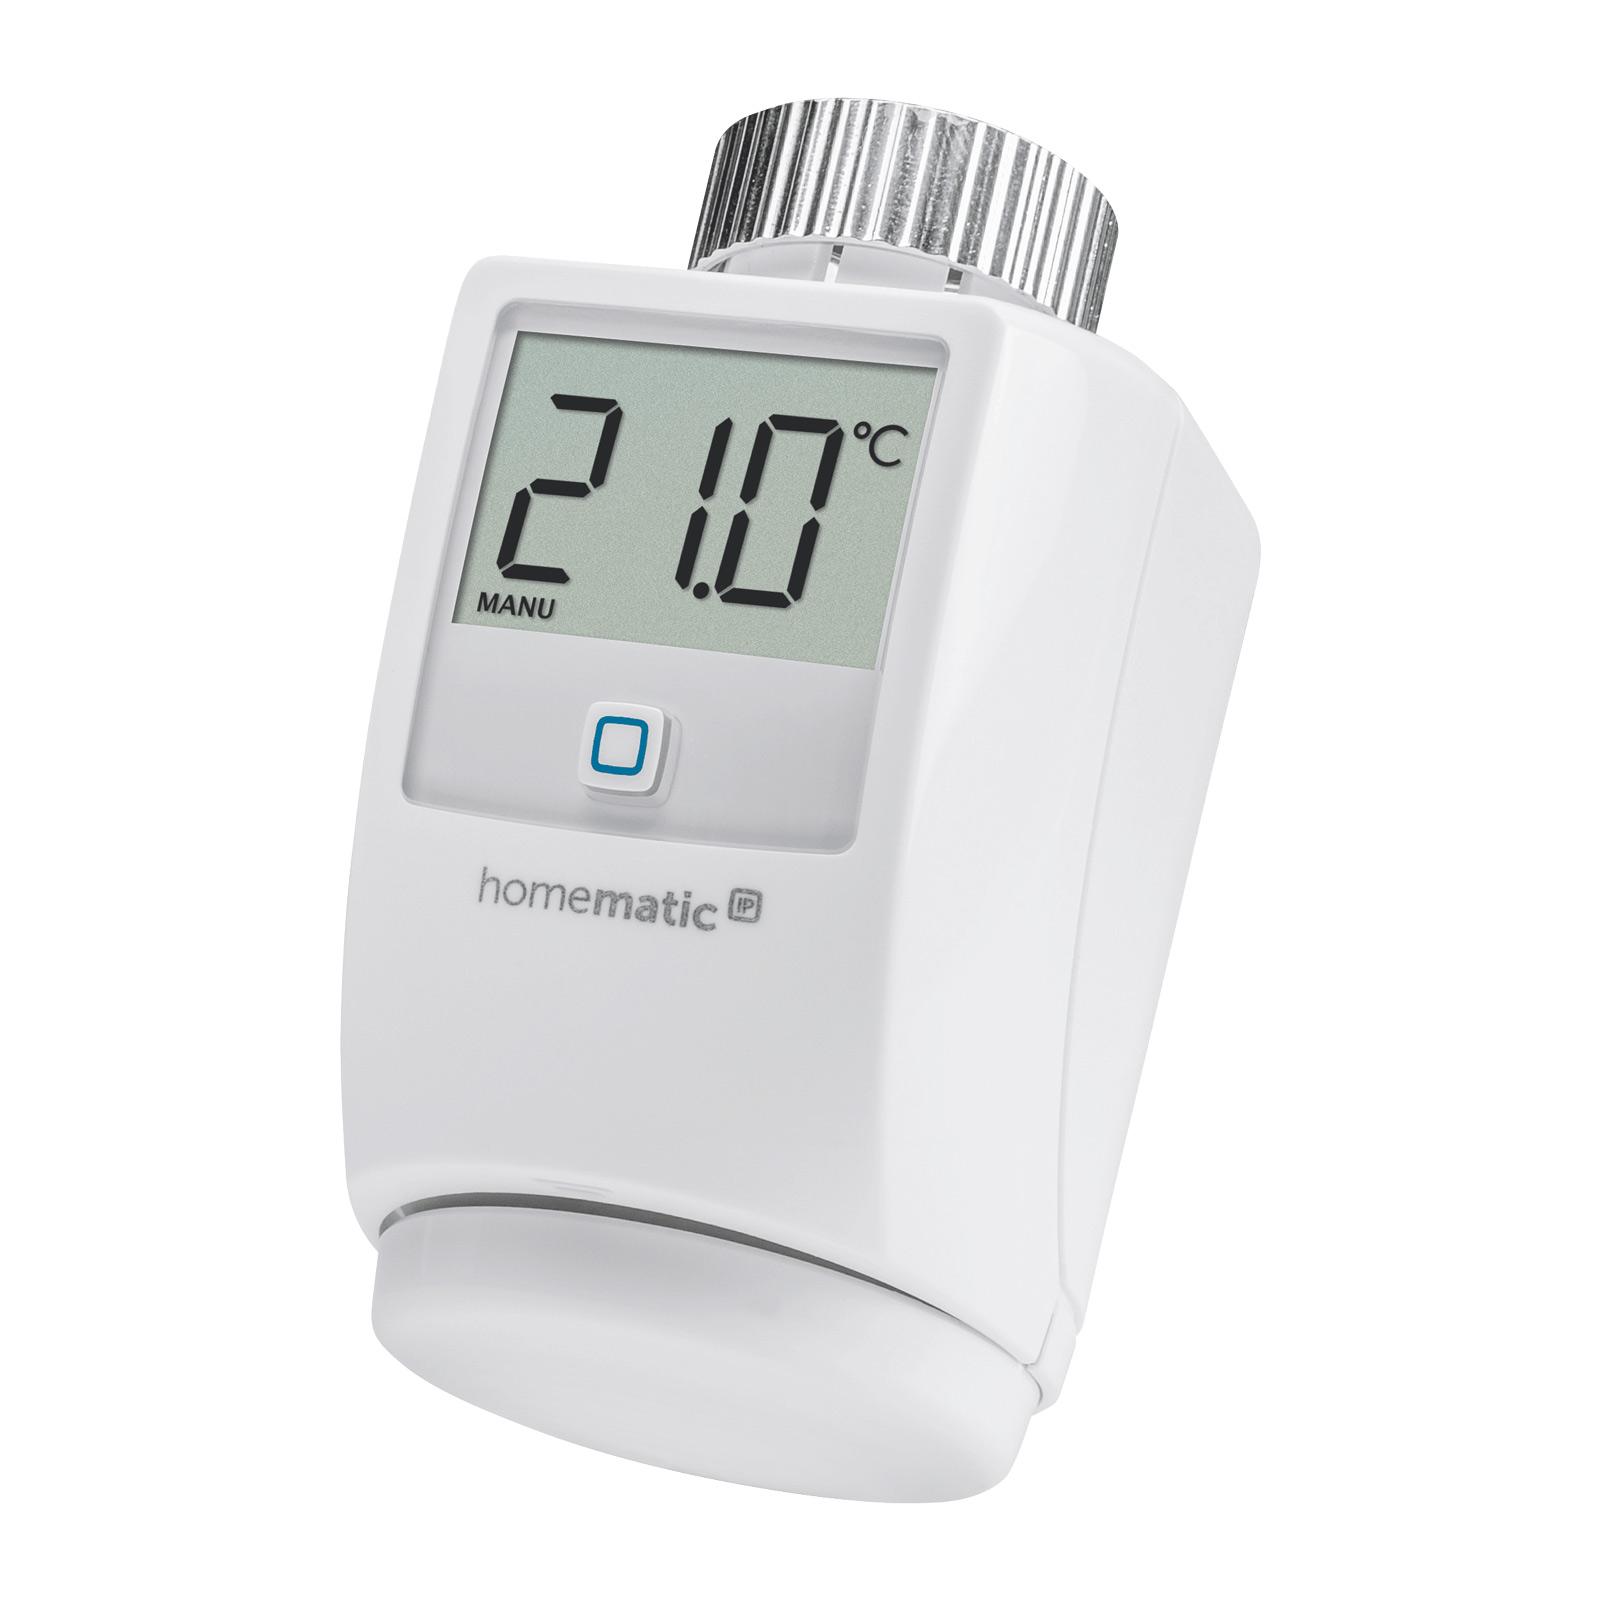 Homematic IP radiatortermostat